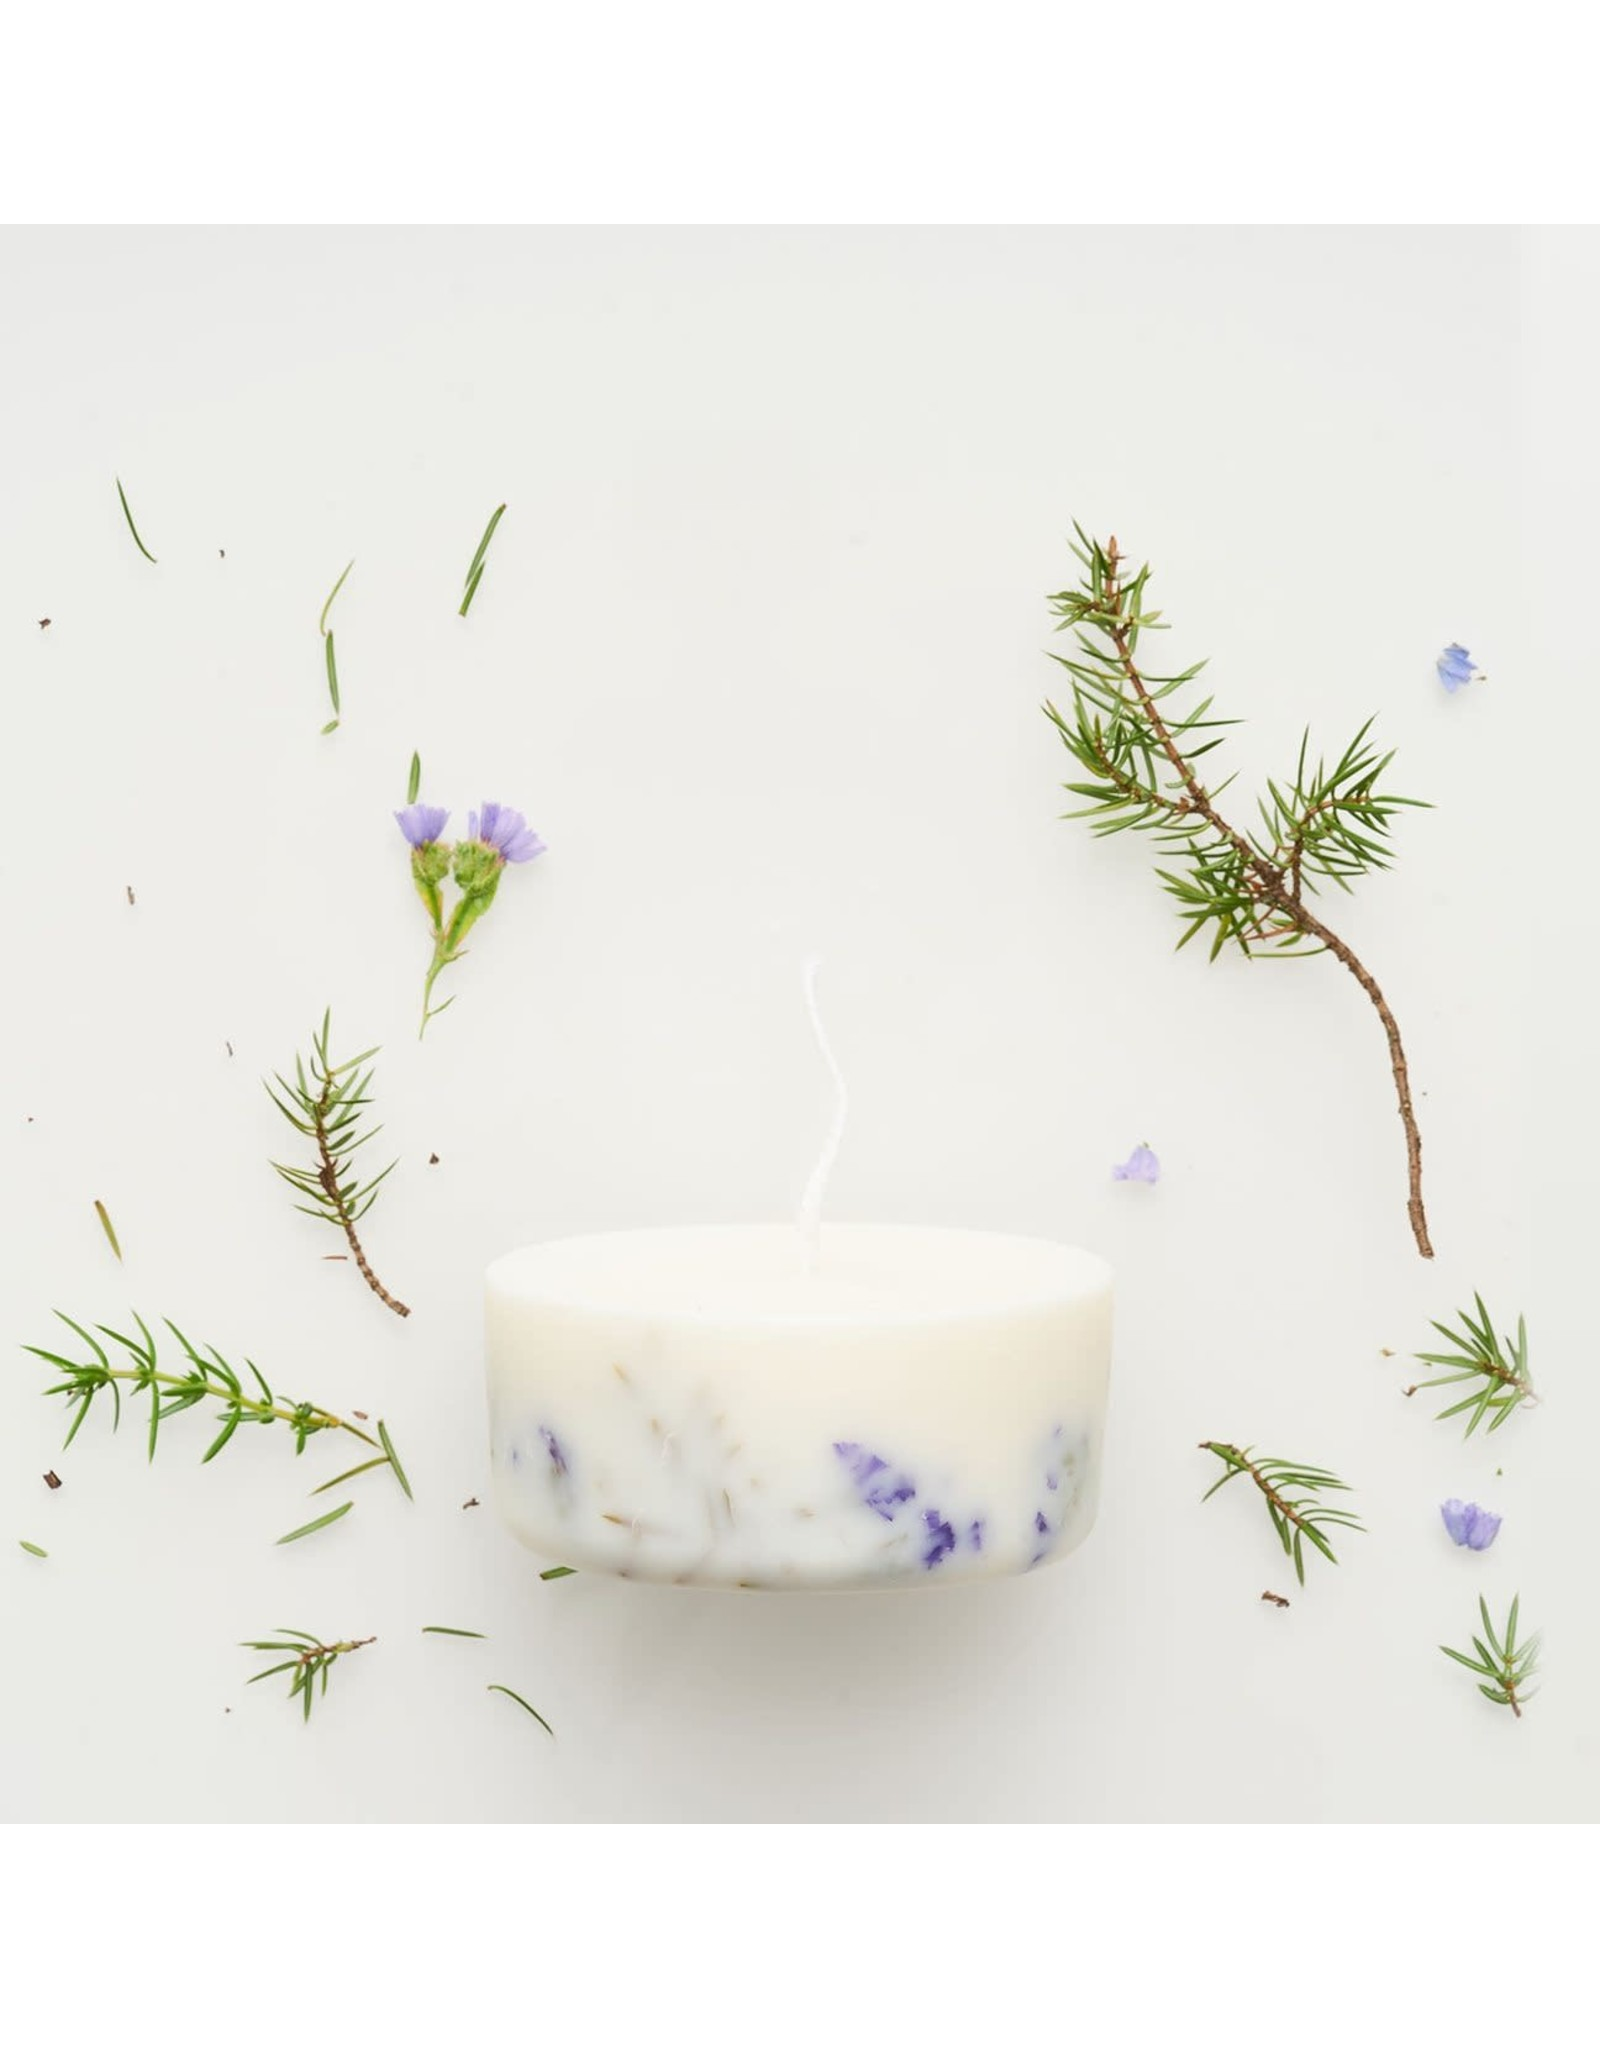 Munio Candela Candle - Juniper & Limonium - Natural Soy Wax - 220ml - Dia 8cm x H 4cm - Burn Time 15h